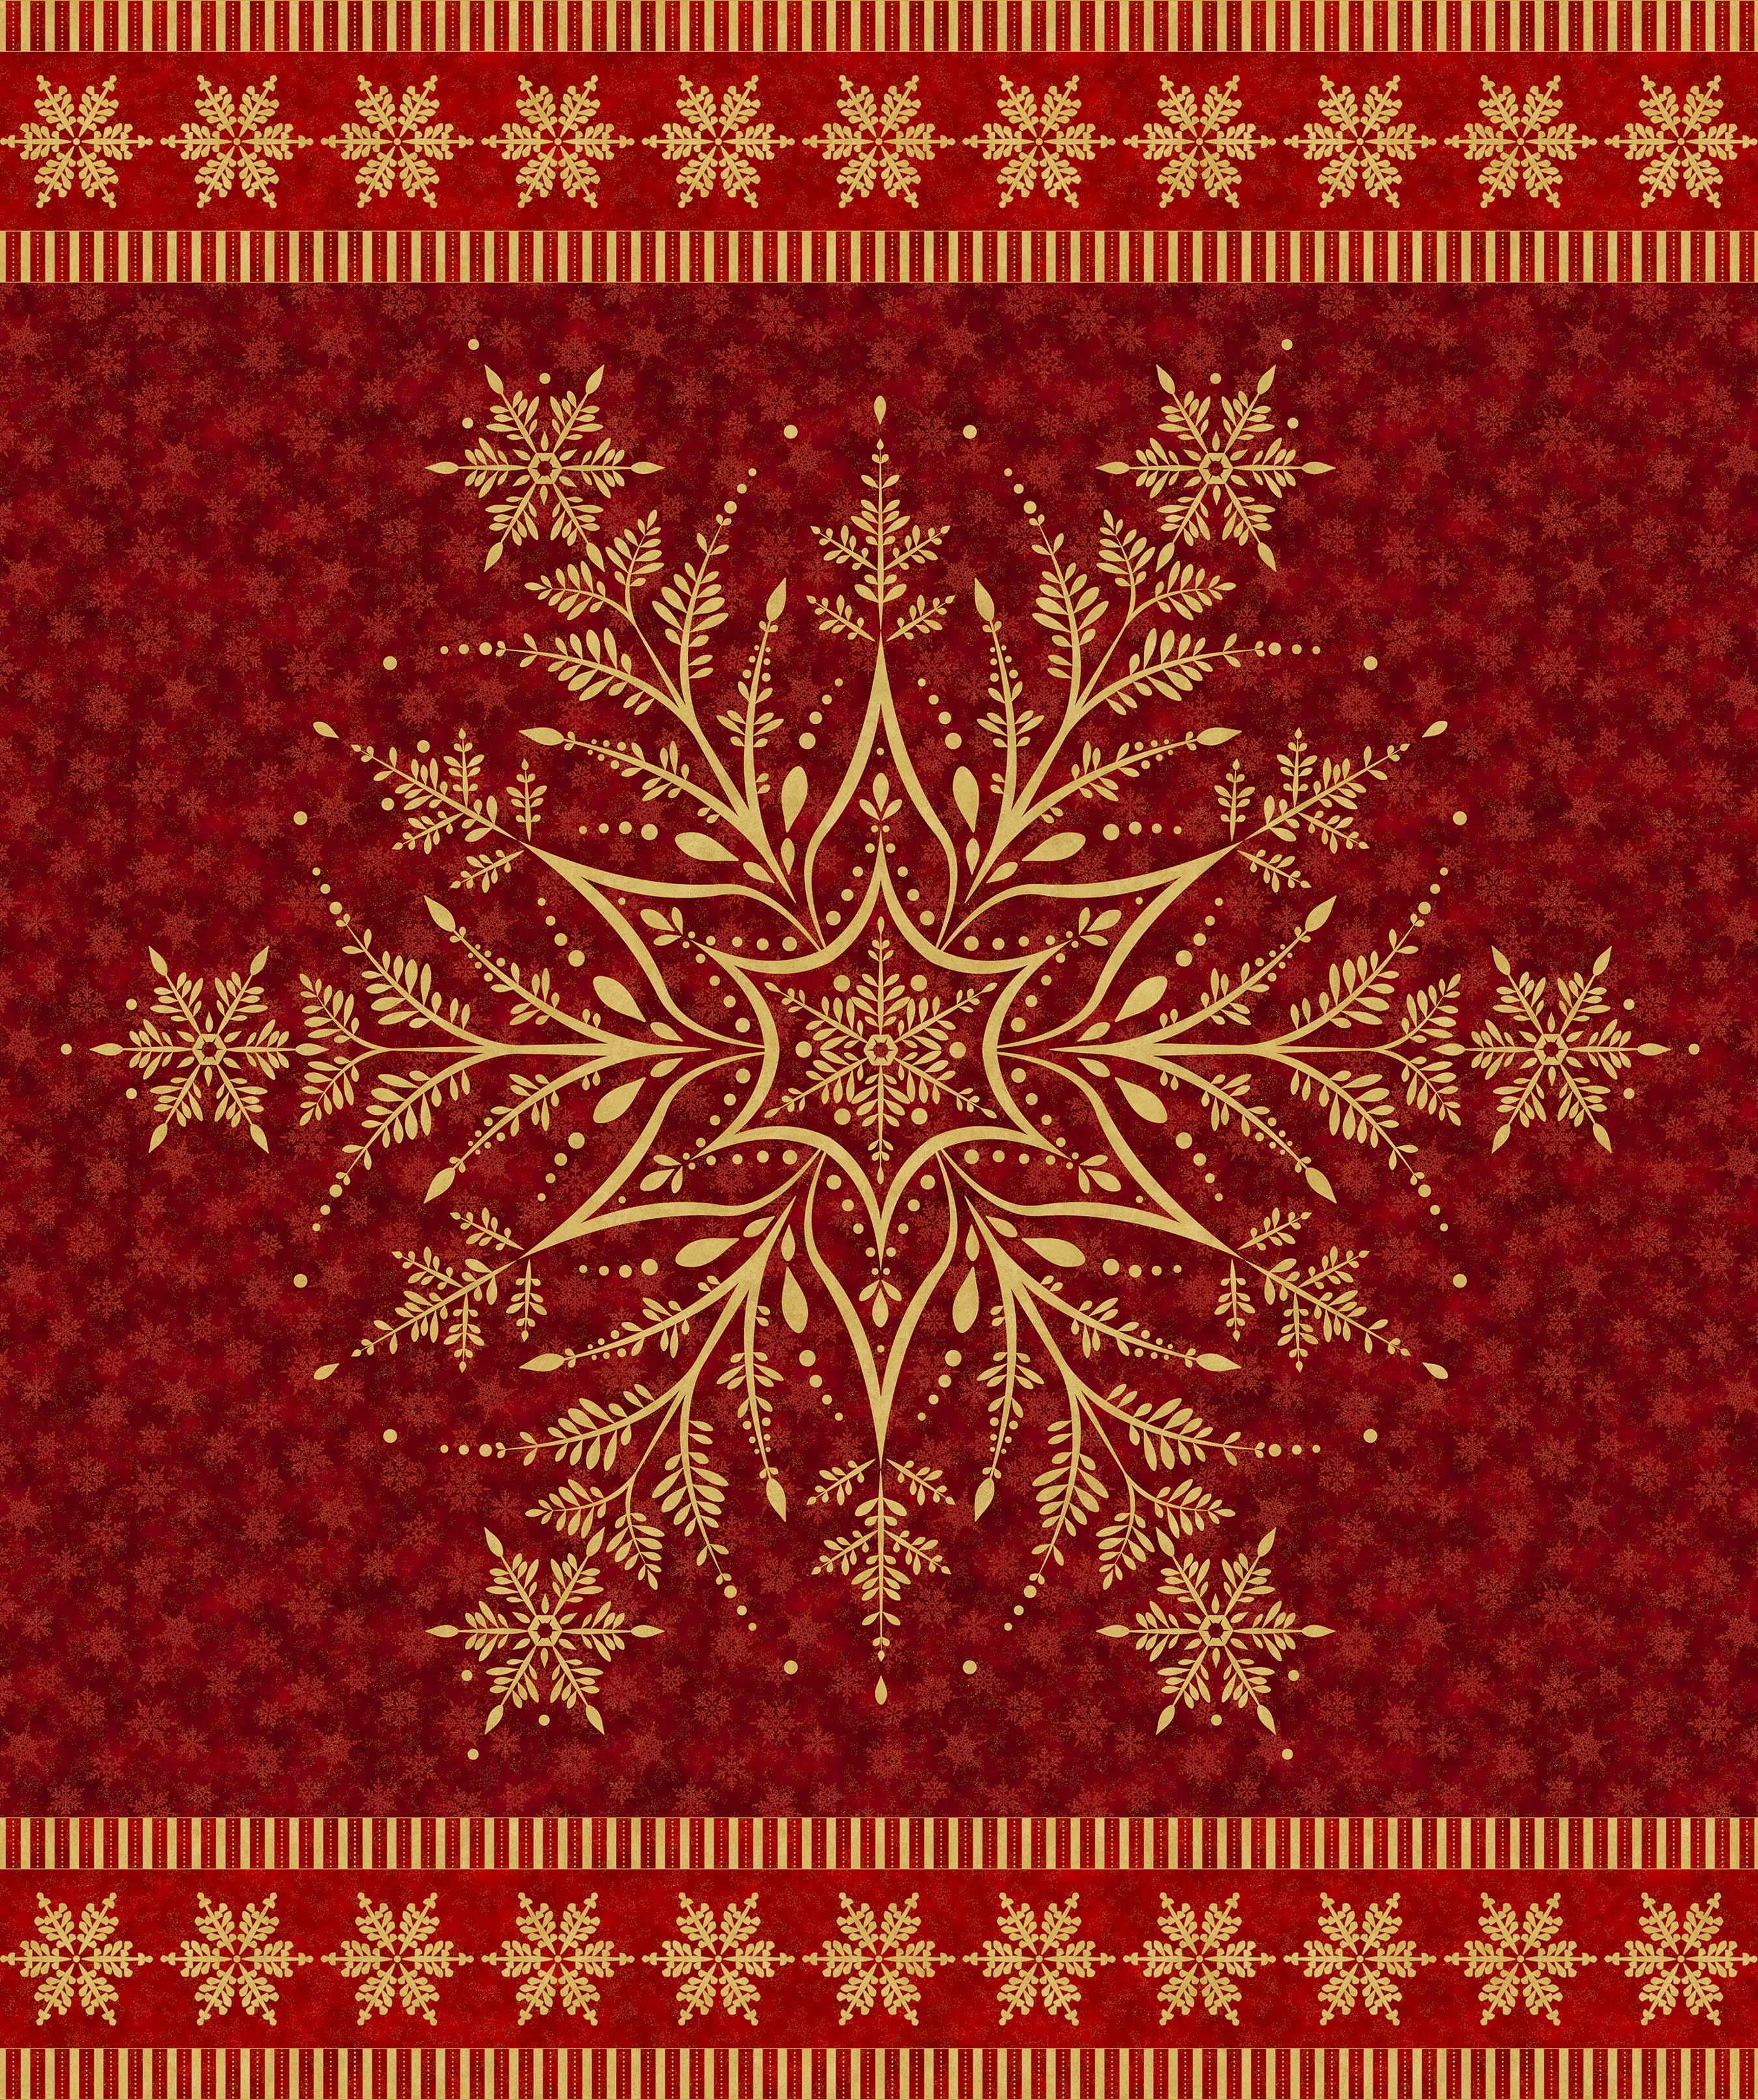 SHIMMER WINTER FROST DARK RED-GOLD PANEL